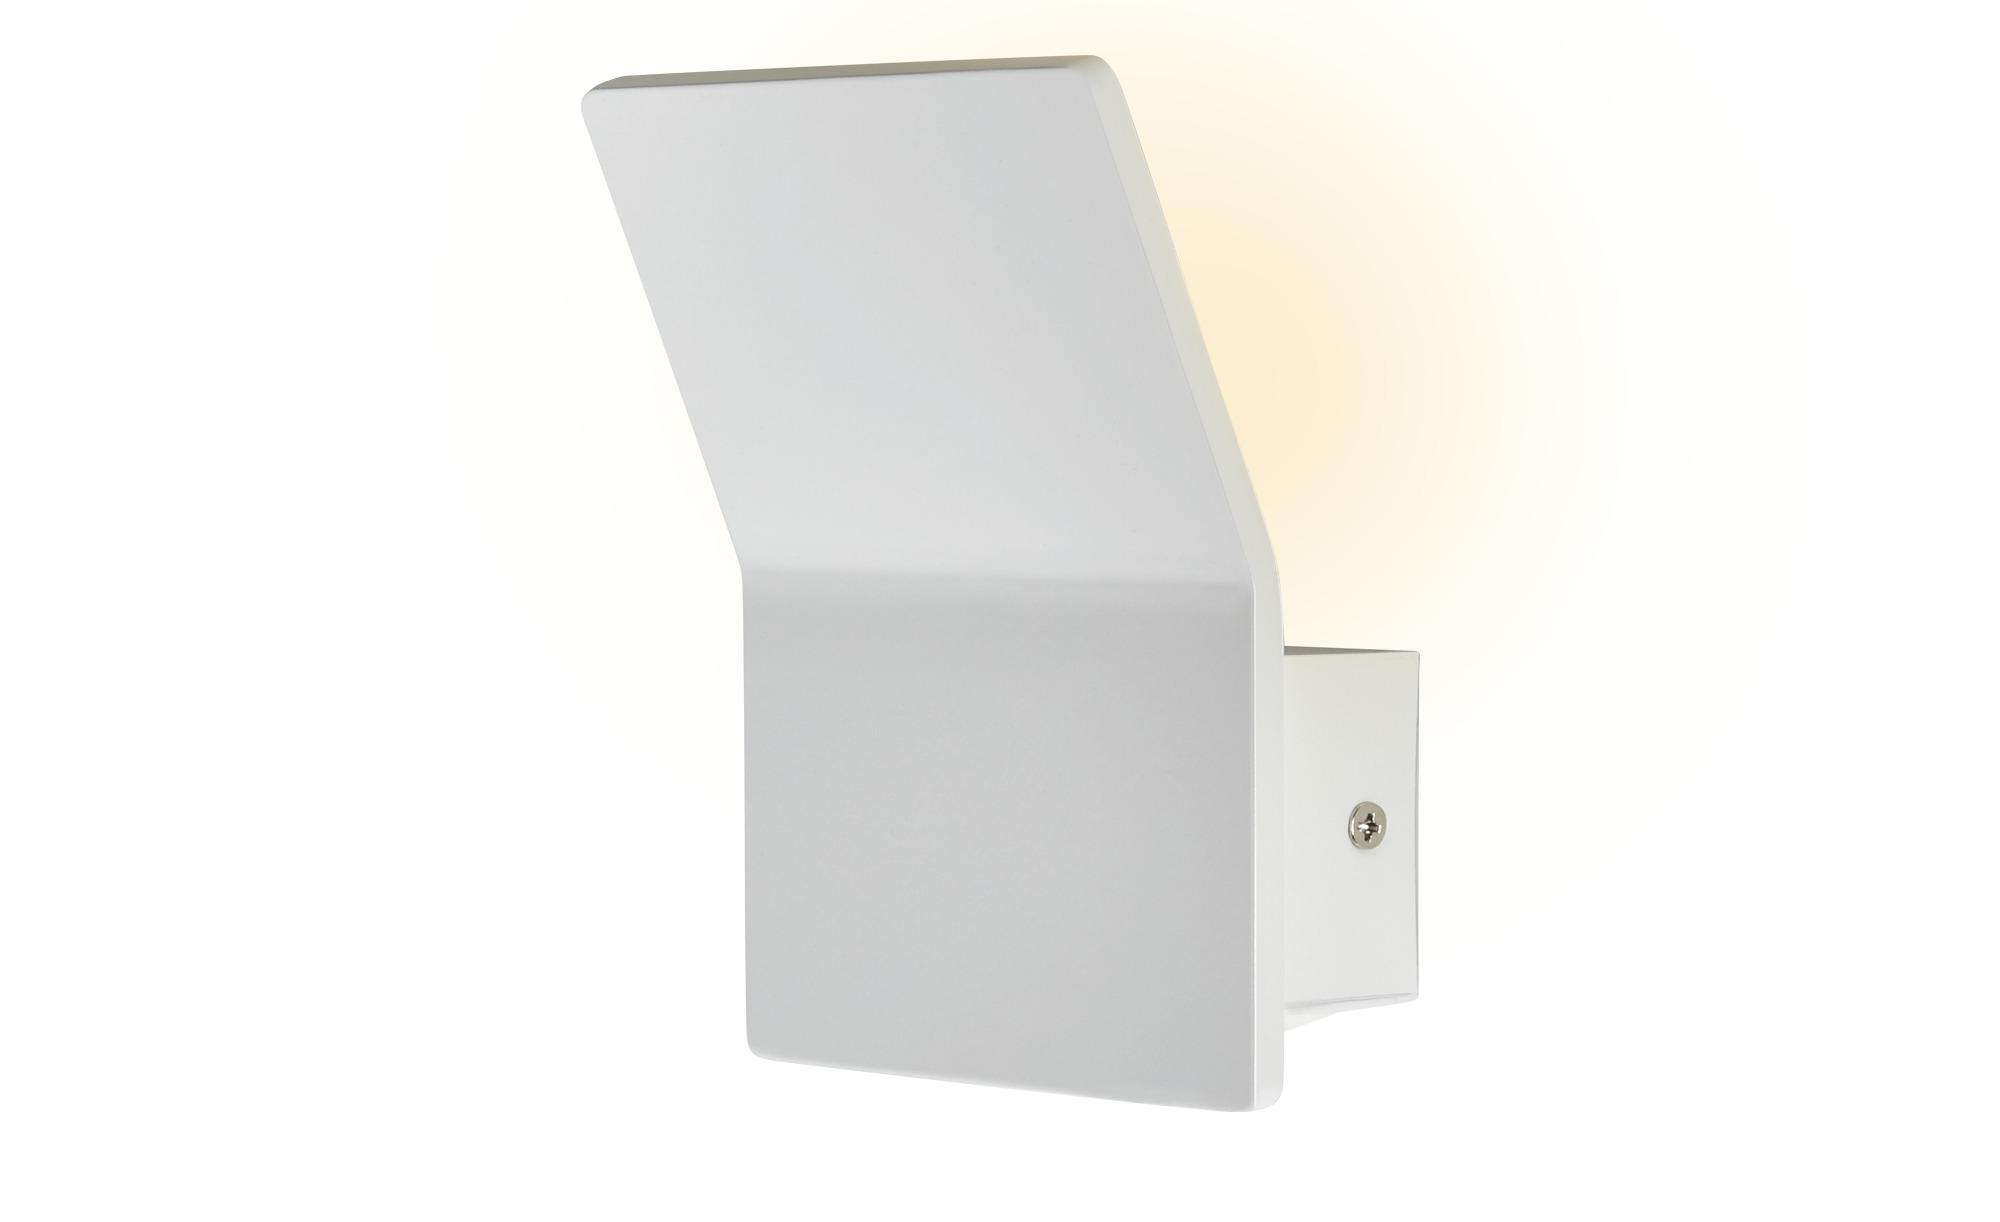 ML LED-Wandleuchte, 1-flammig, Weiß ¦ weiß ¦ Maße (cm): B: 12 H: 7 Lampen & Leuchten > Innenleuchten > Wandleuchten - Höffner